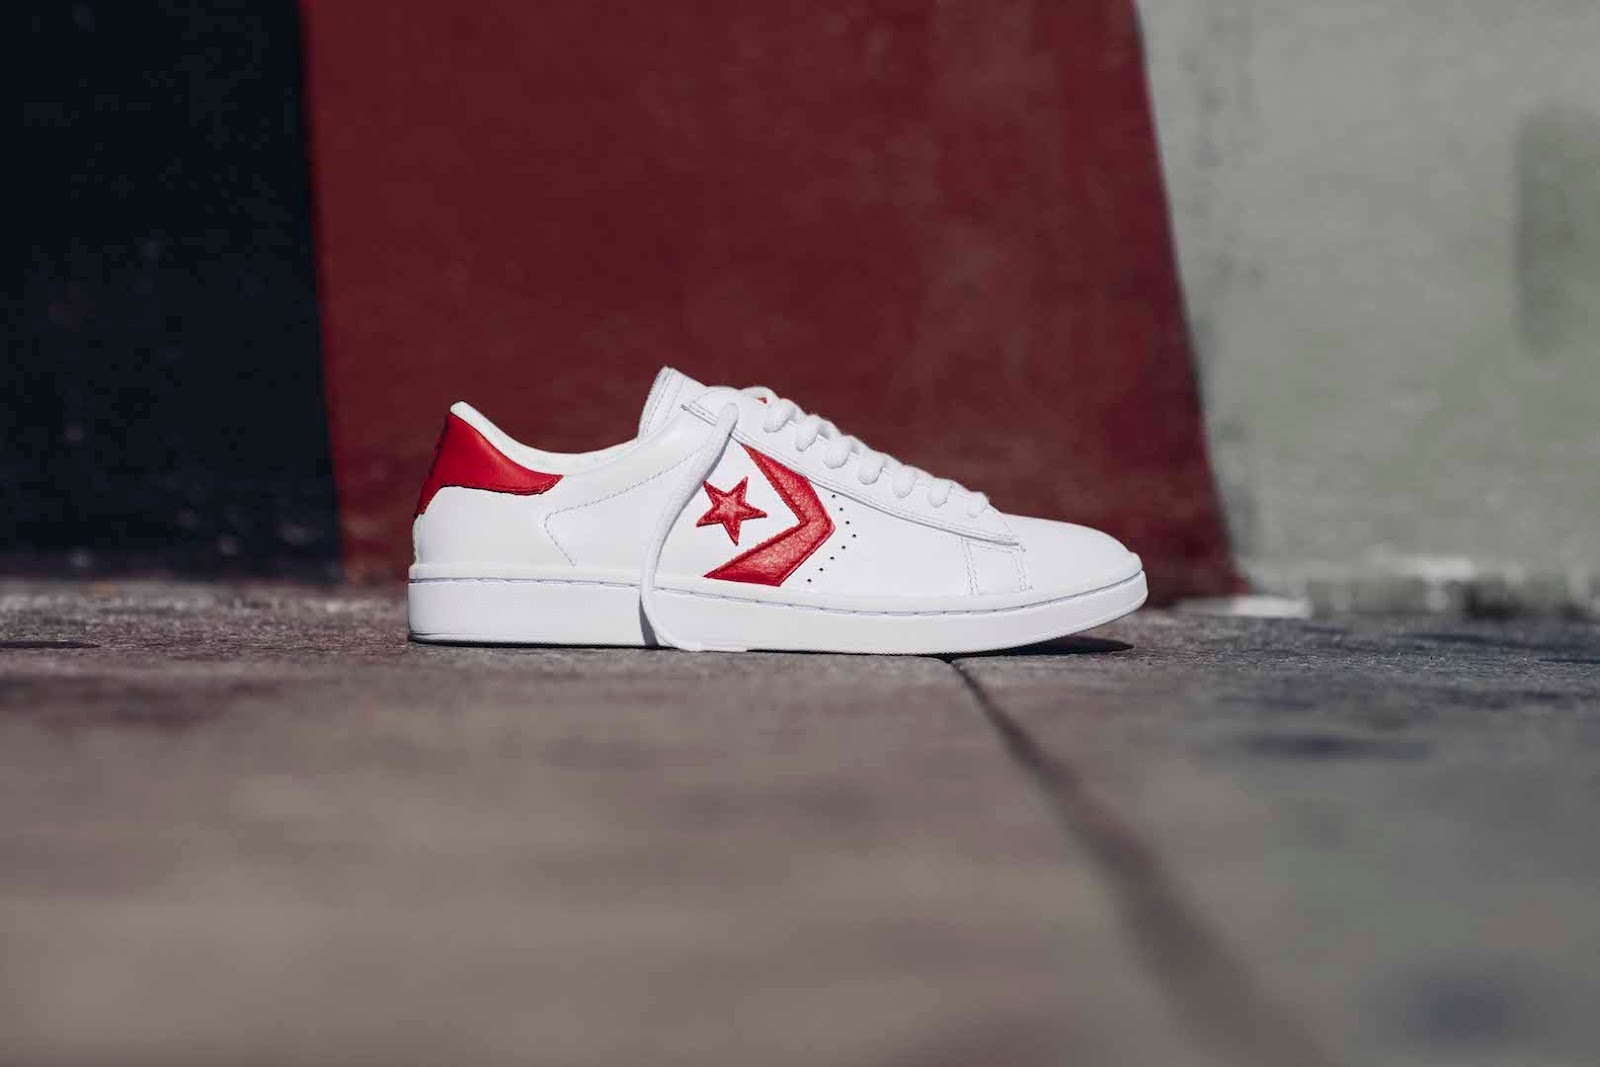 ad827e210e60 Converse Cons Pro Leather Sneakers  Low Profile Court Classic - It s ...